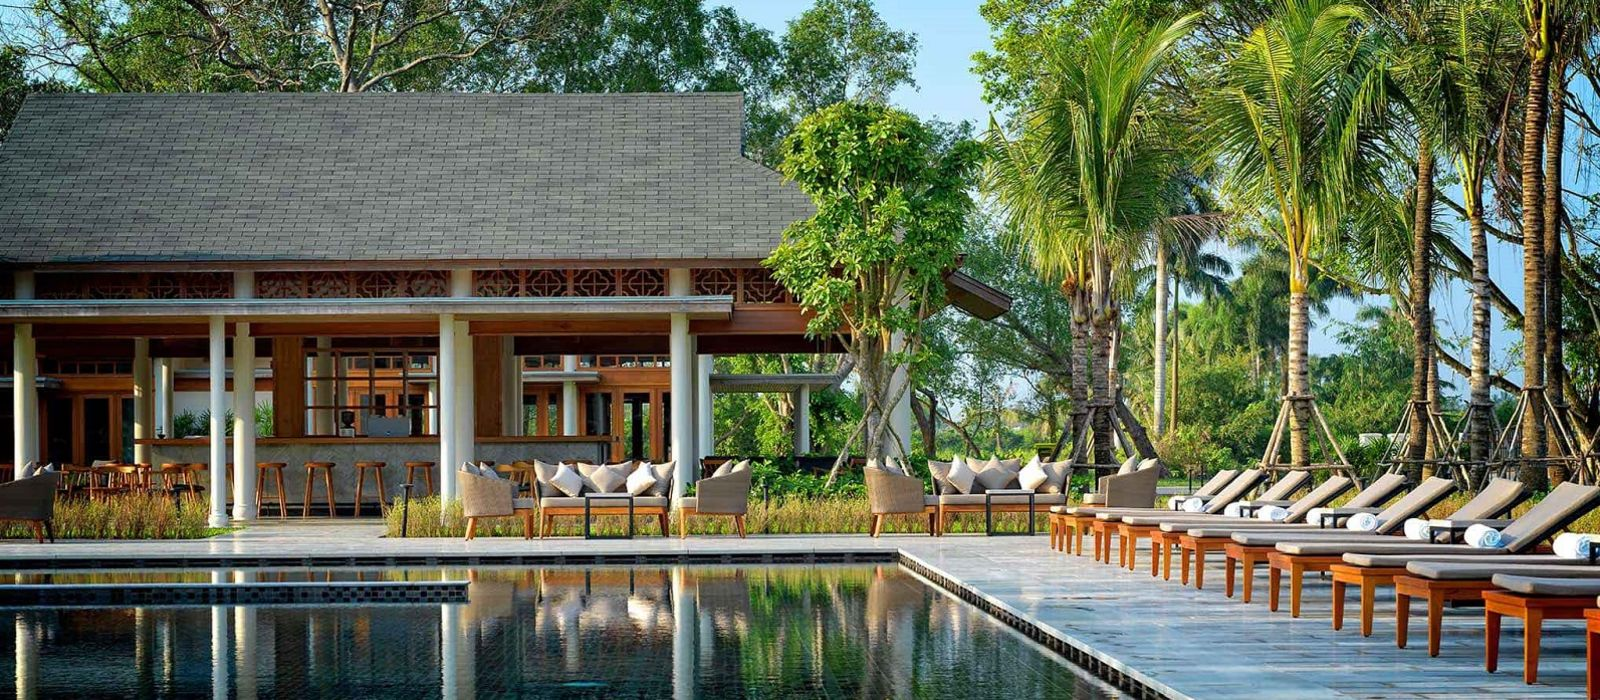 Hotel Azerai Can Tho Vietnam